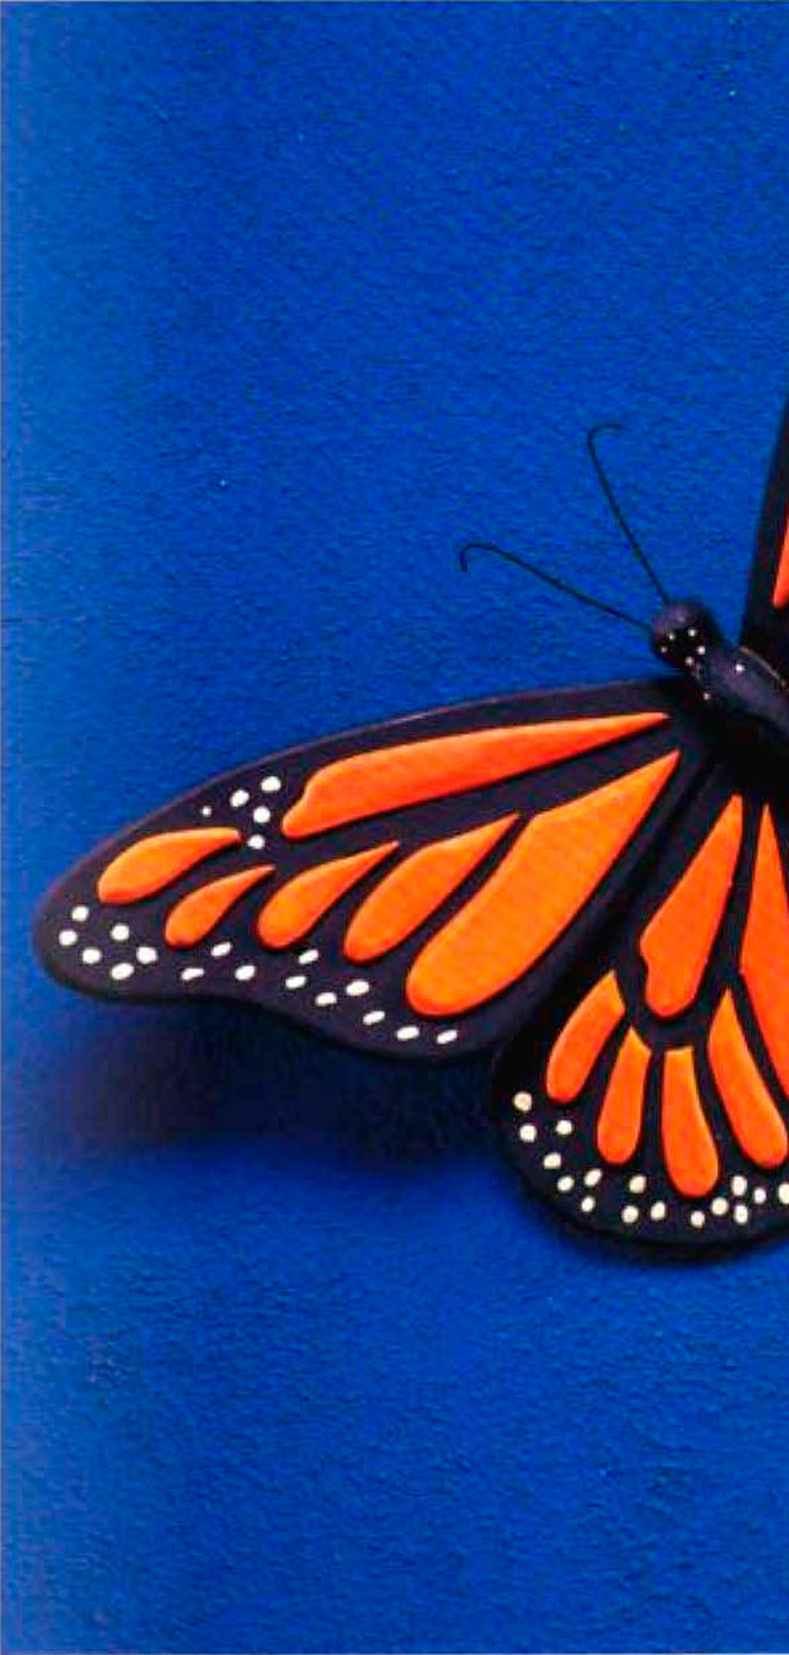 Monarch butterfly body - photo#7